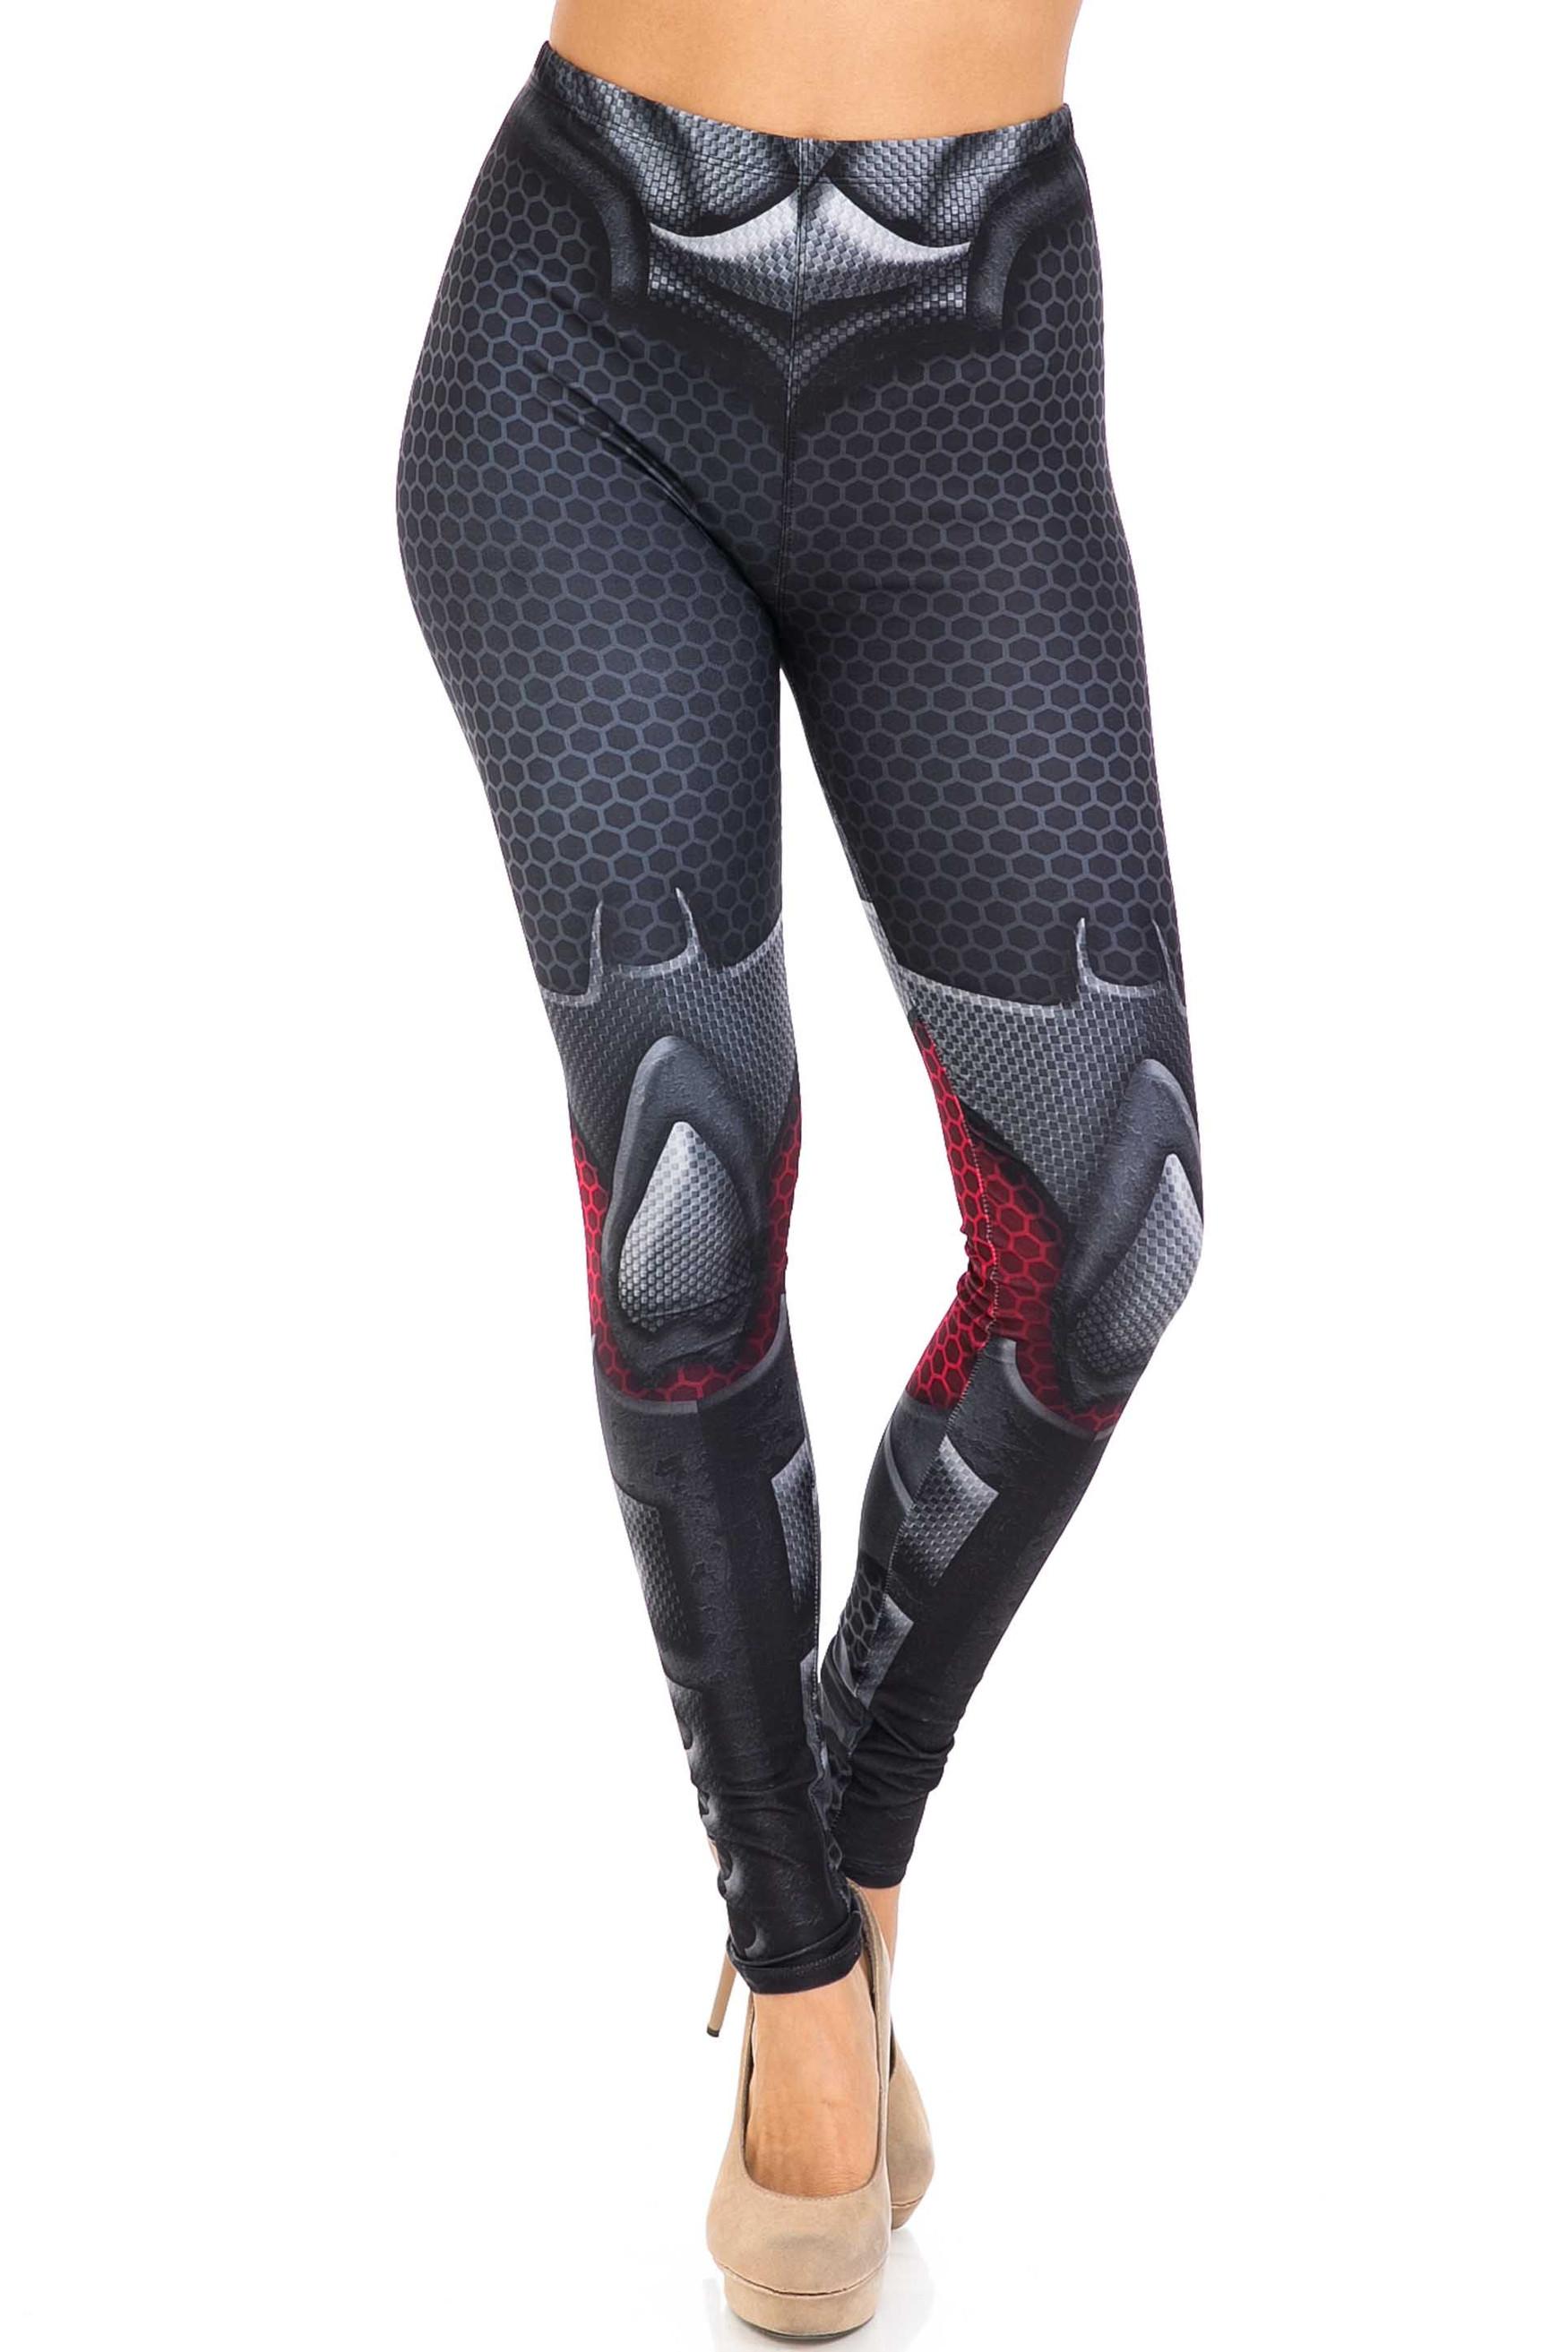 Creamy Soft Pretty Avenger Leggings - USA Fashion™